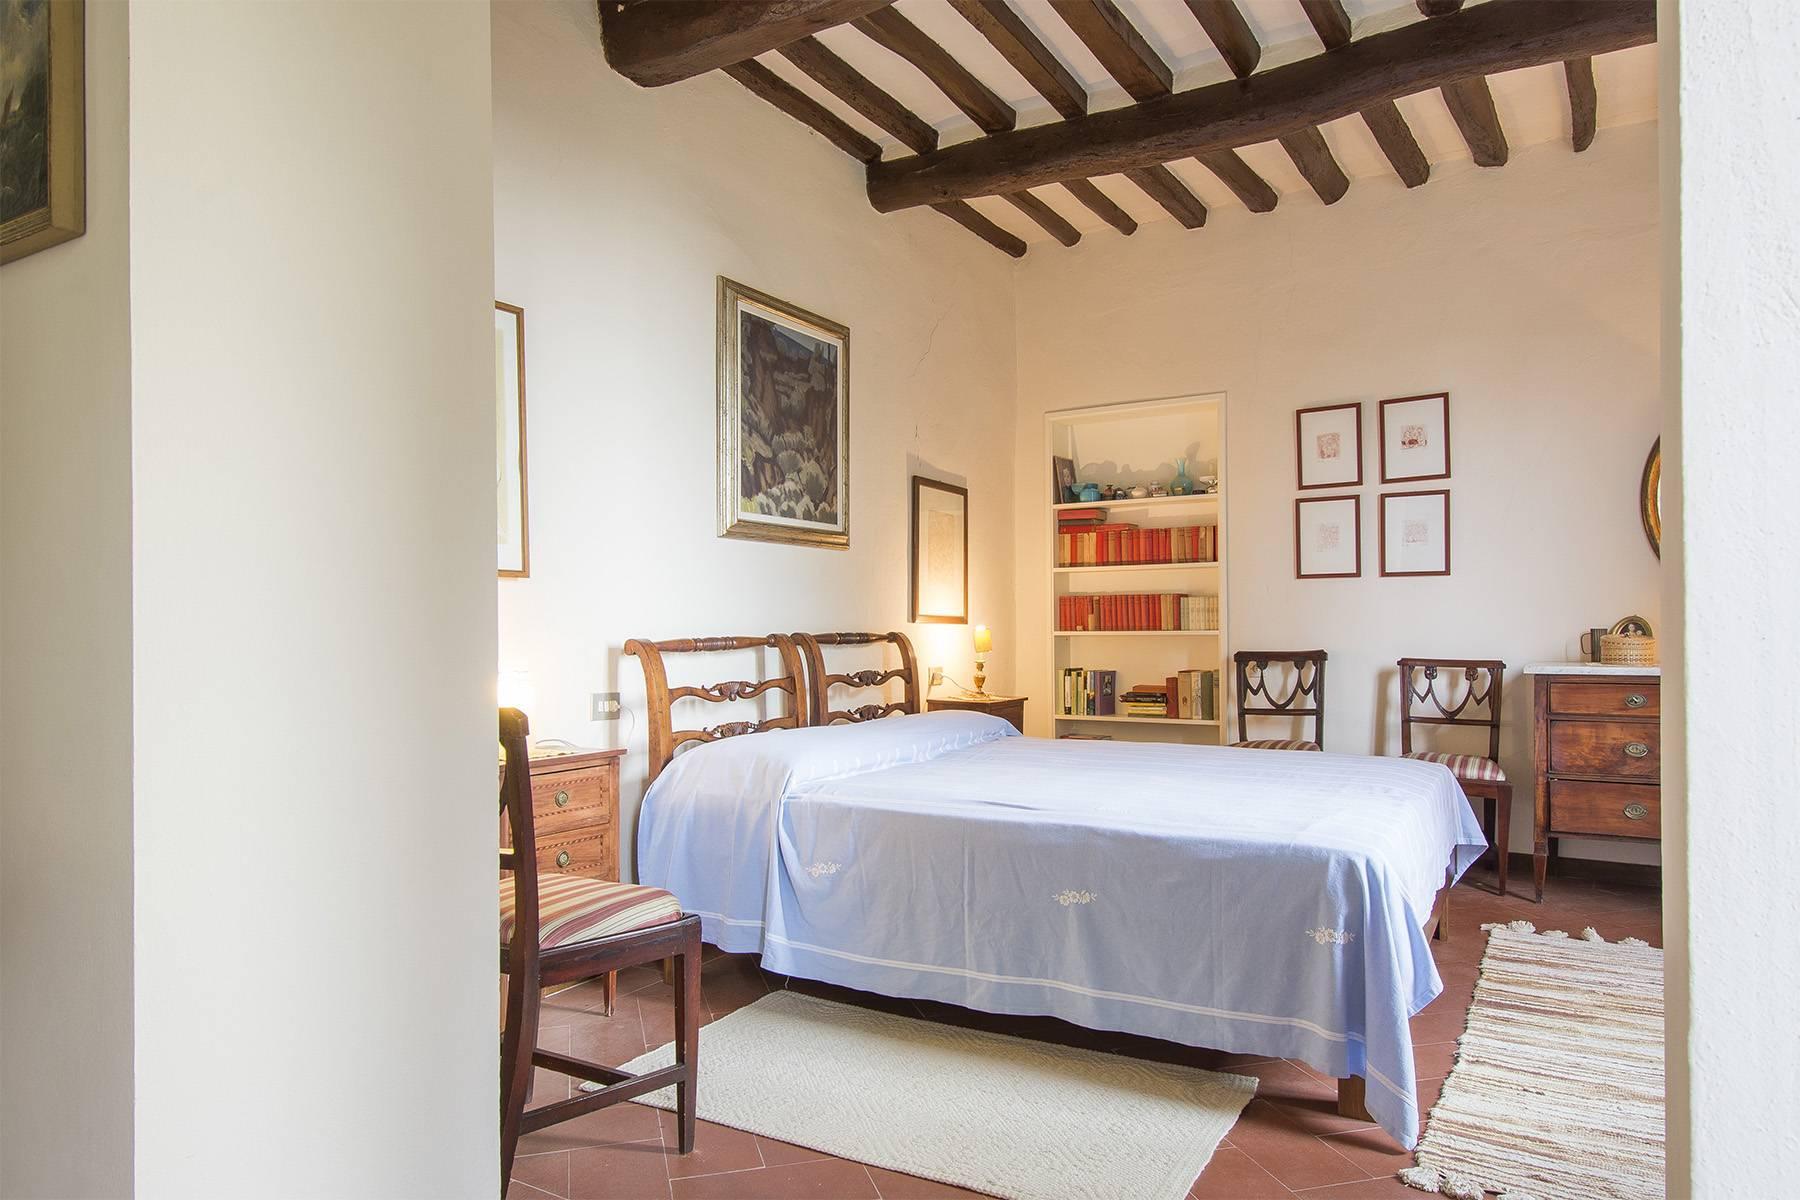 Winery with Historic Villa in San Miniato, Pisa - 14